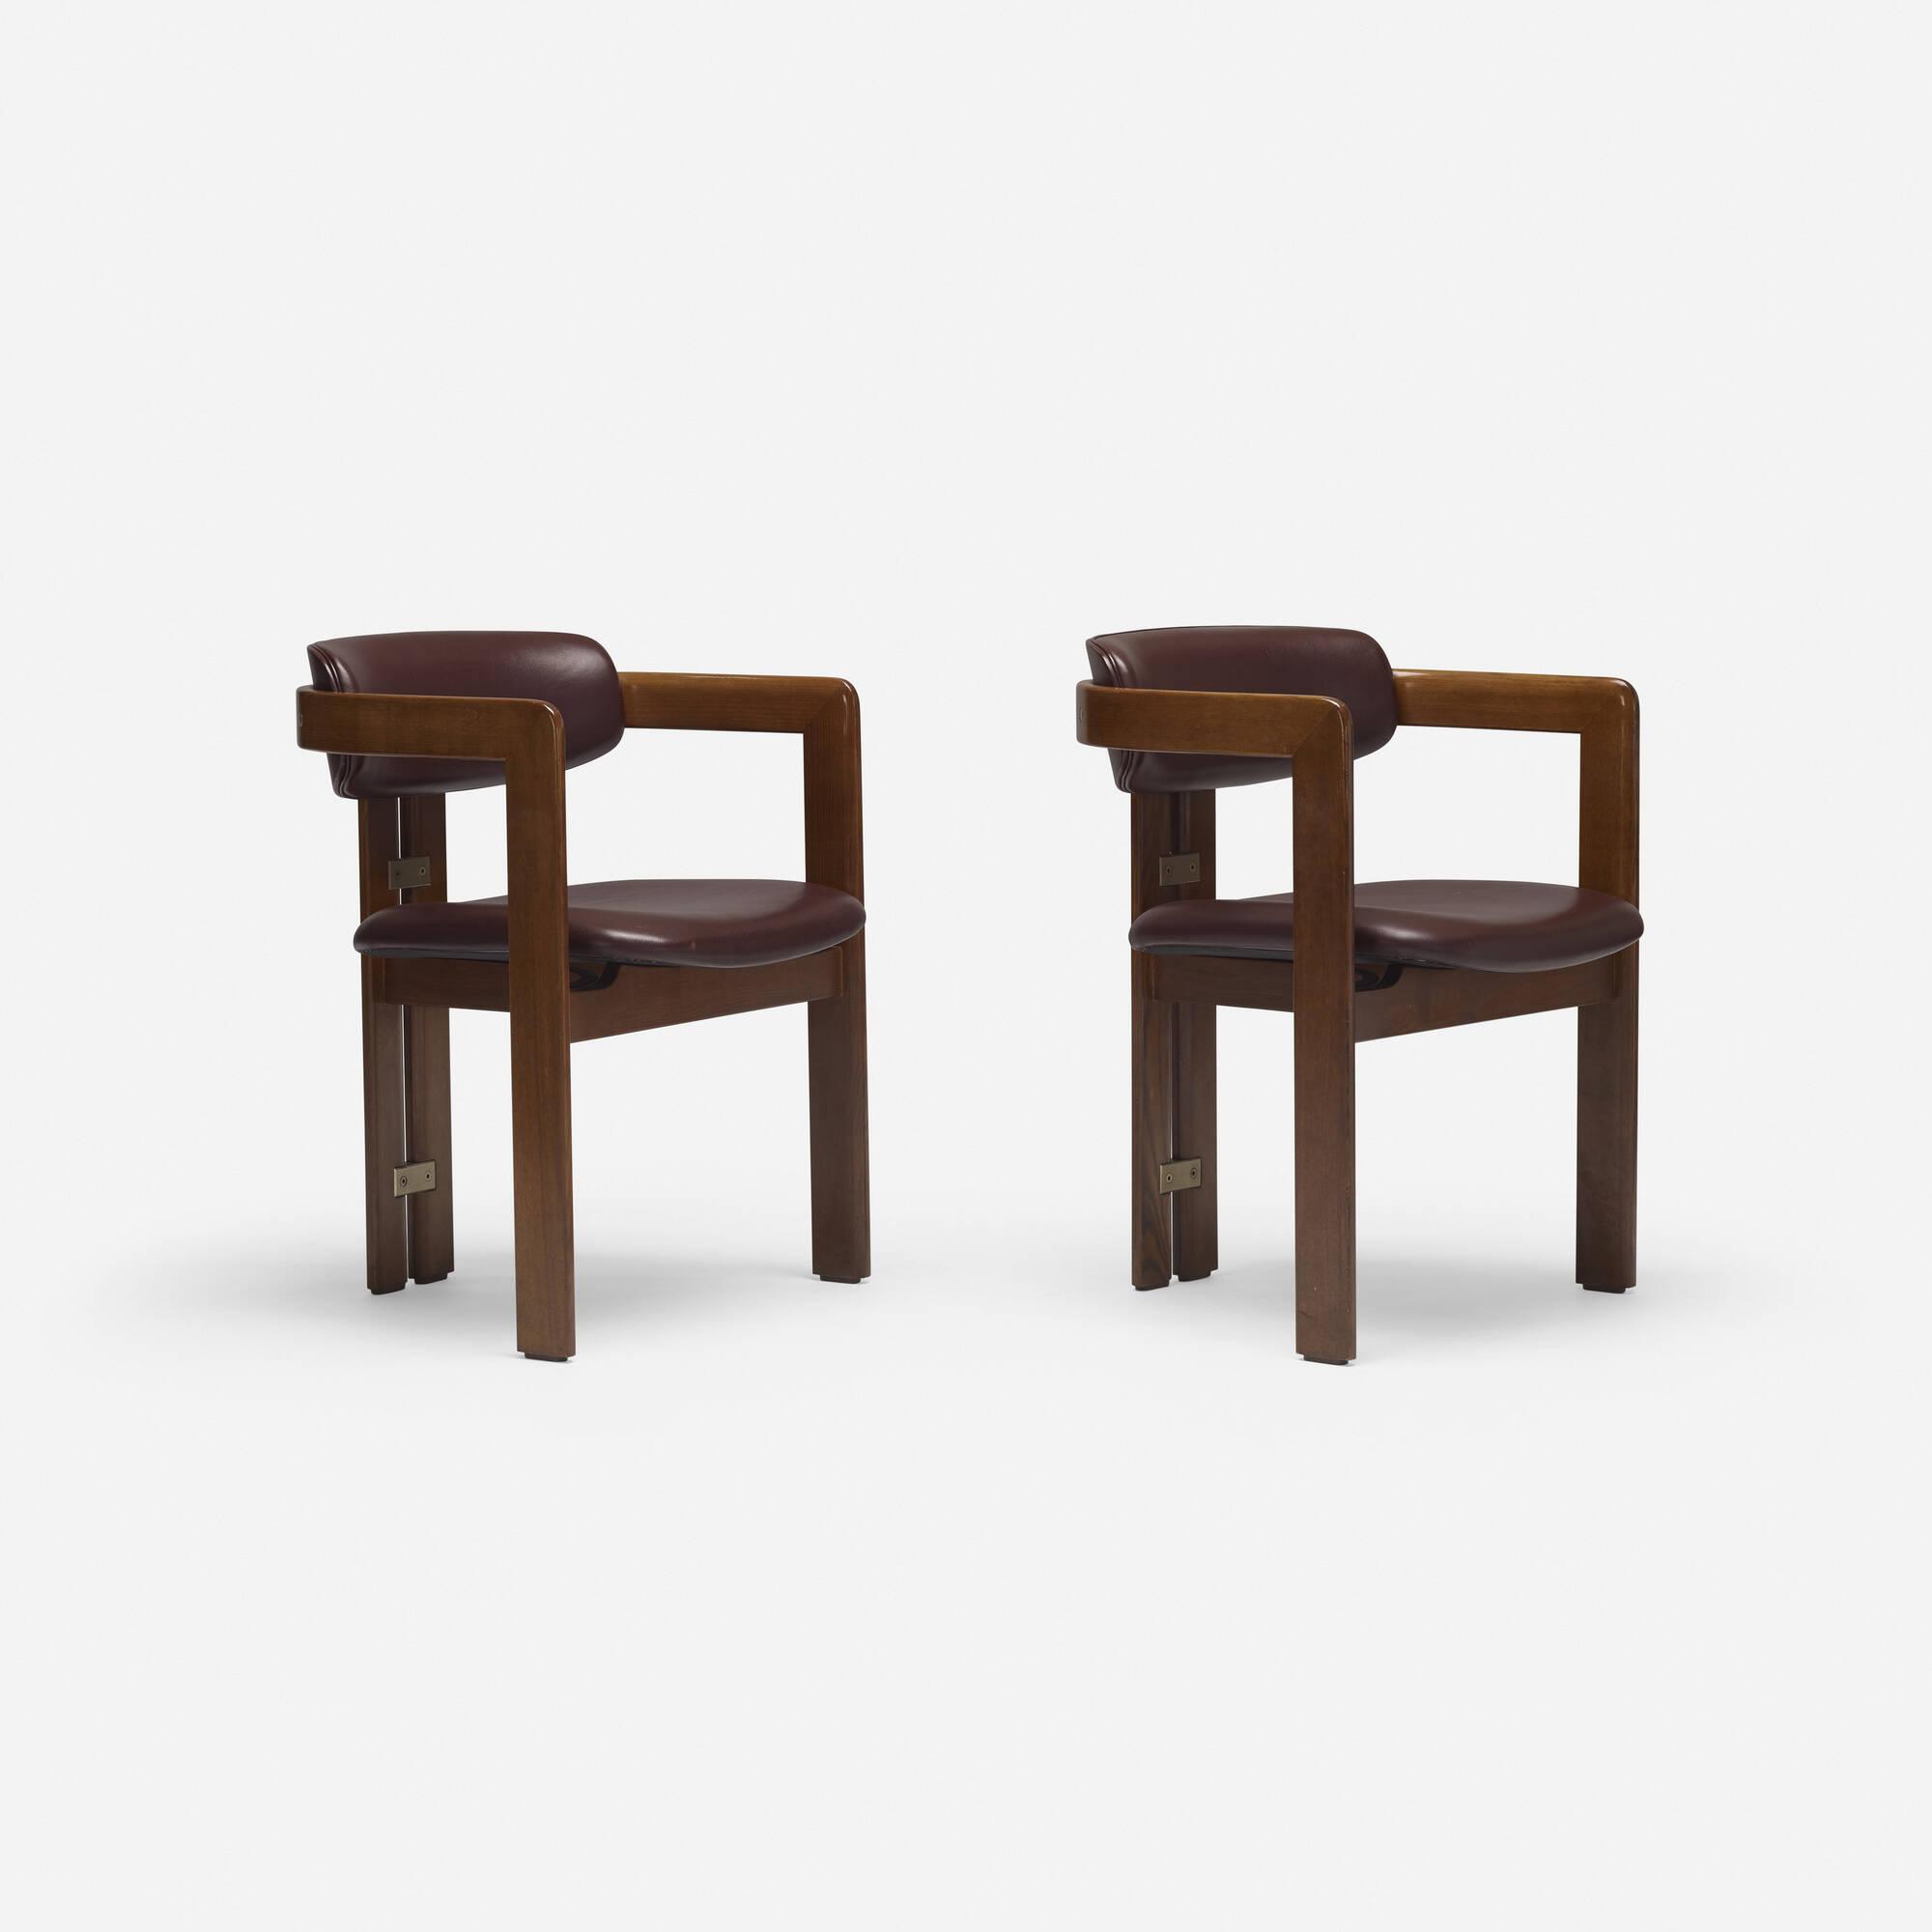 711: Augusto Savini / Pamplona dining chairs, pair (1 of 4)